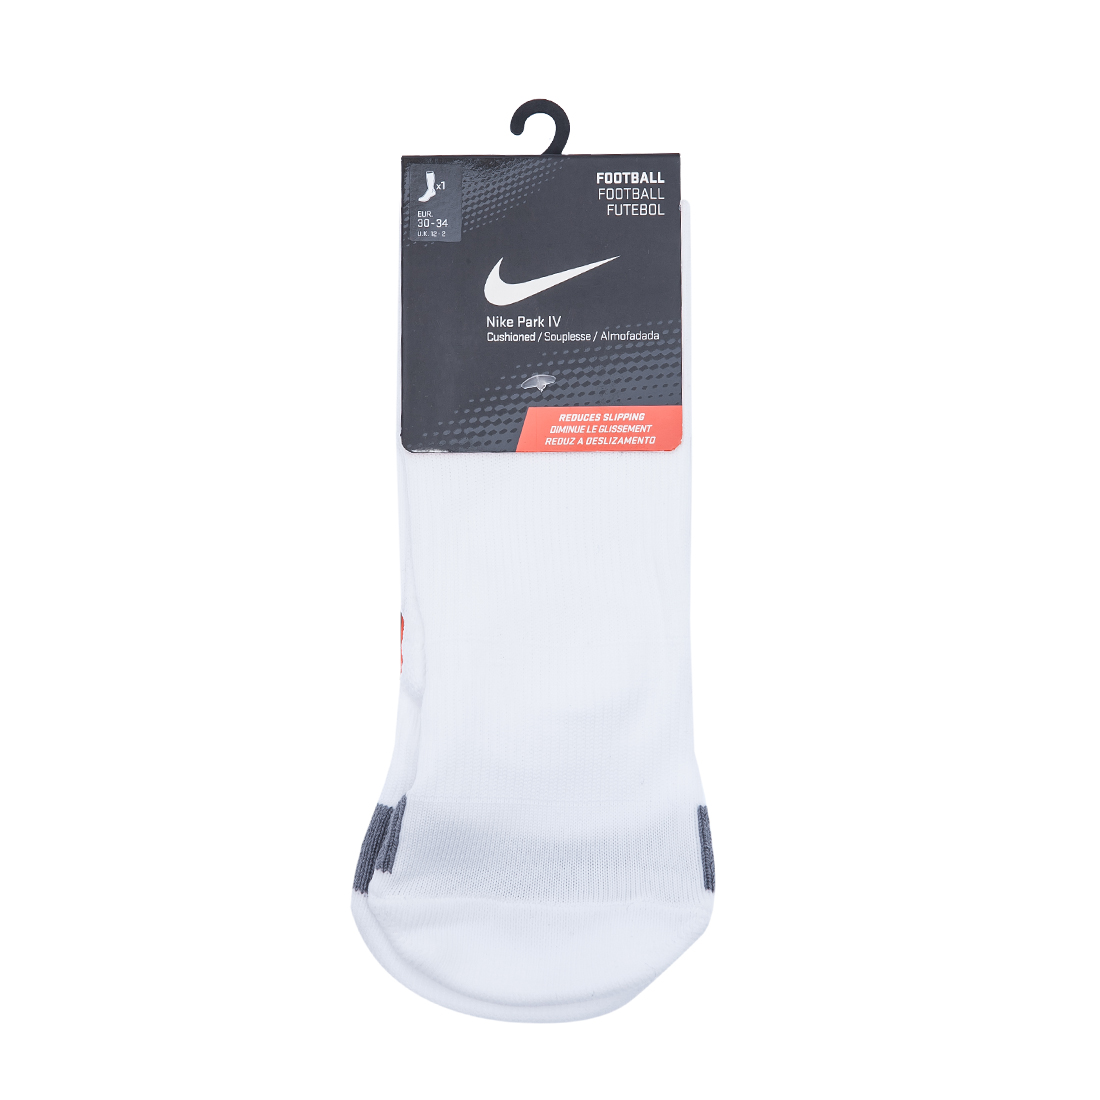 NIKE - Σετ κάλτσες Nike λευκές γυναικεία αξεσουάρ κάλτσες